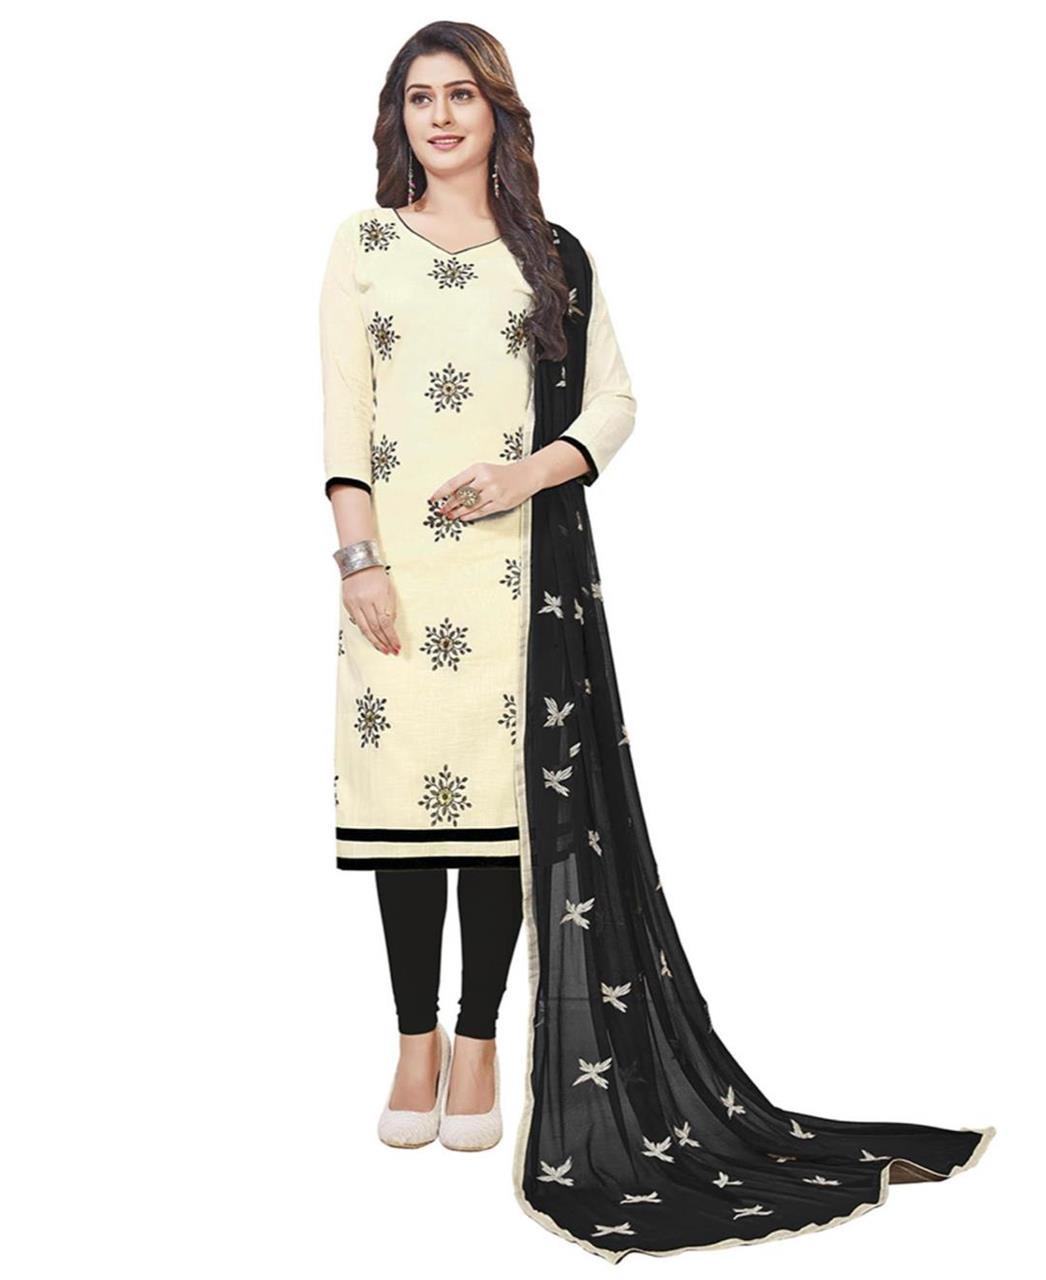 Embroidered Cotton Cream Straight Cut Salwar